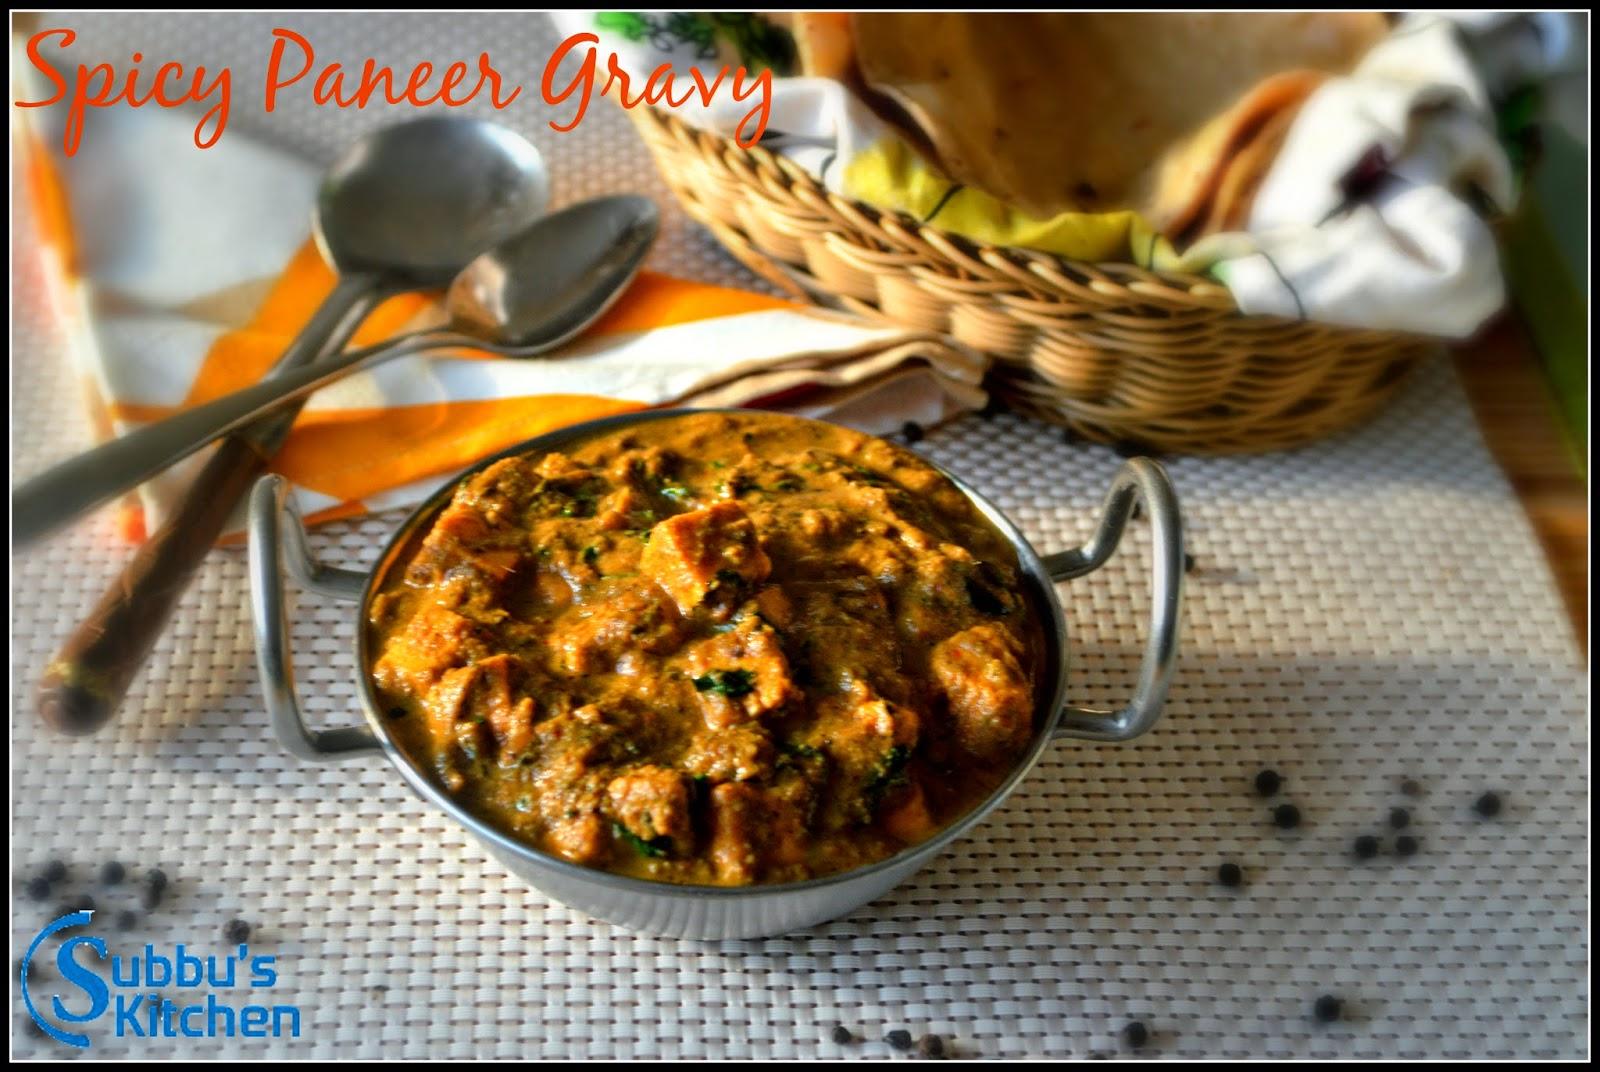 Spicy Paneer Gravy